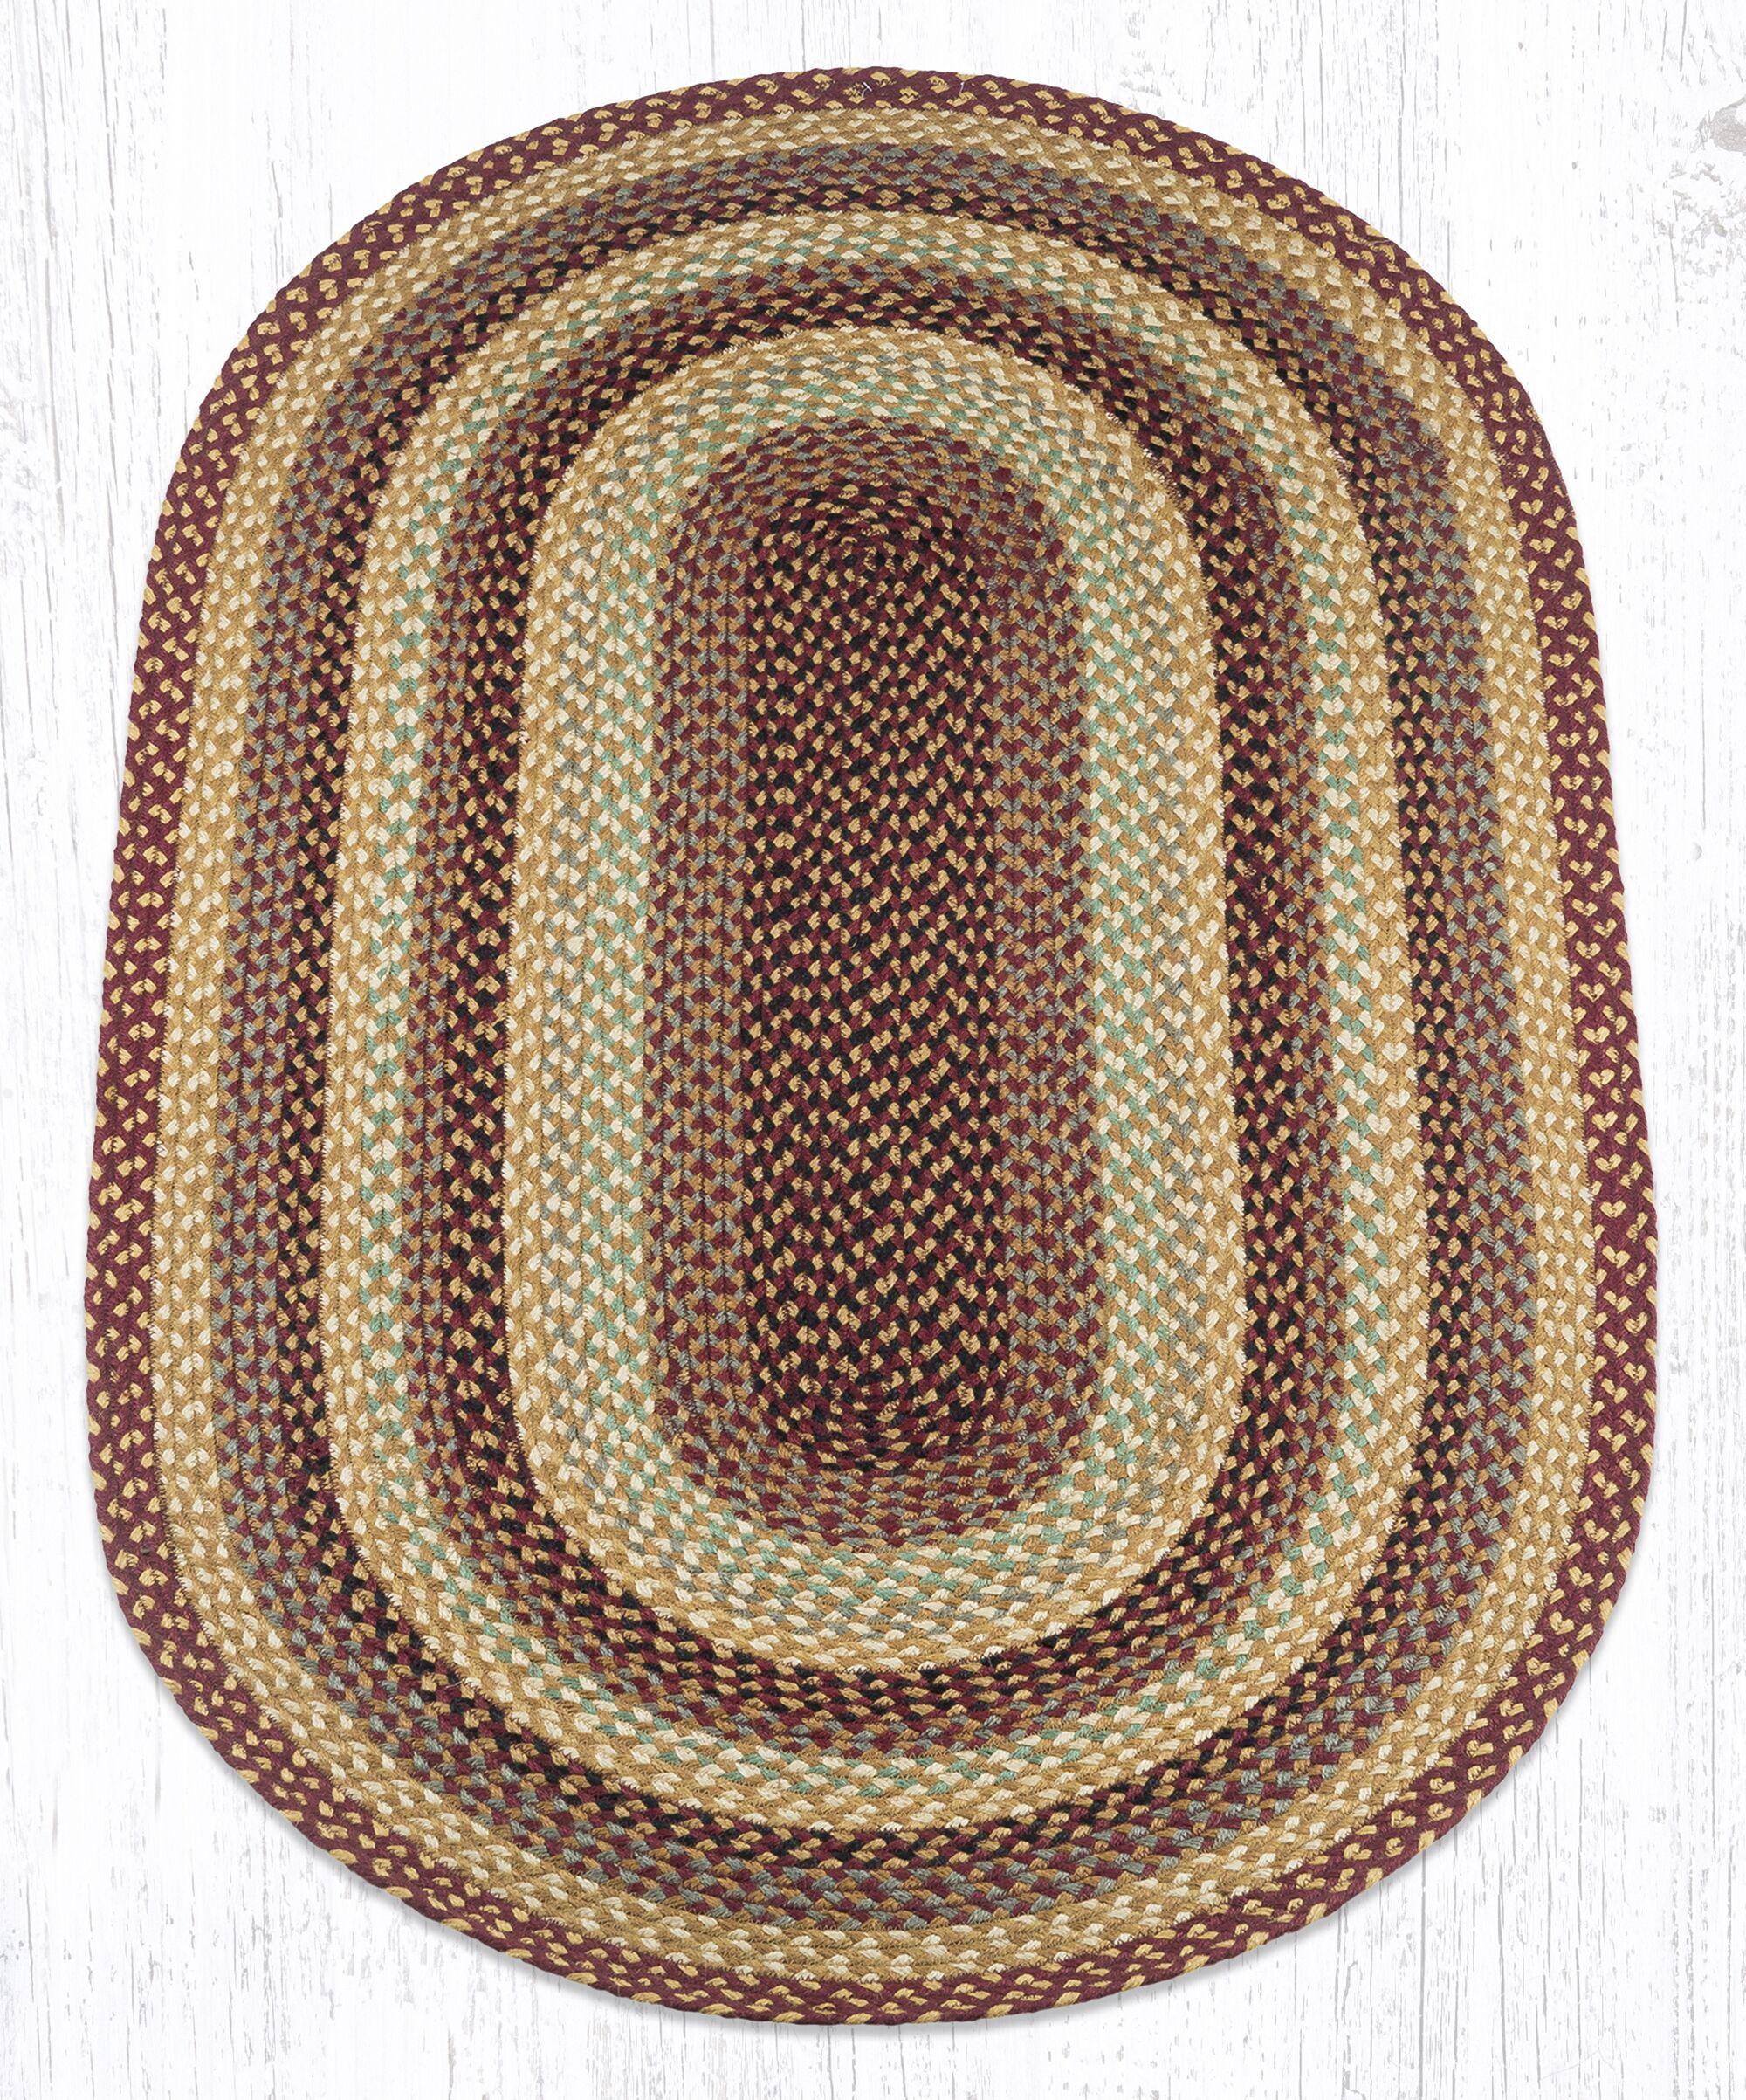 Burgundy/Gray/Crème Braided Area Rug Rug Size: Oval 3' x 5'